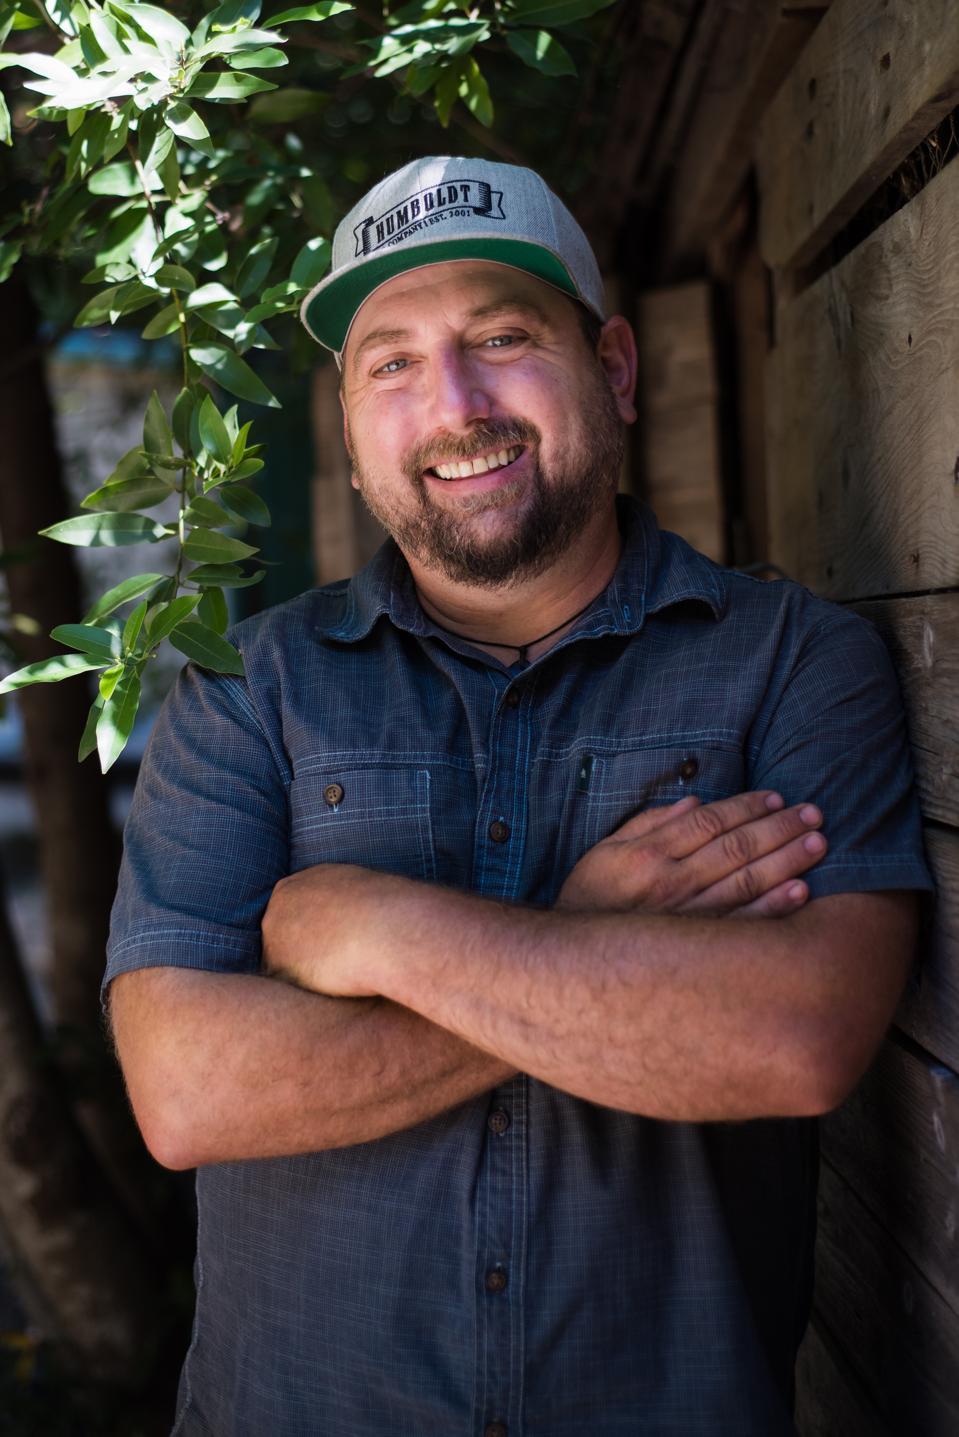 Nathaniel Pennington CEO: Humboldt Seed Company